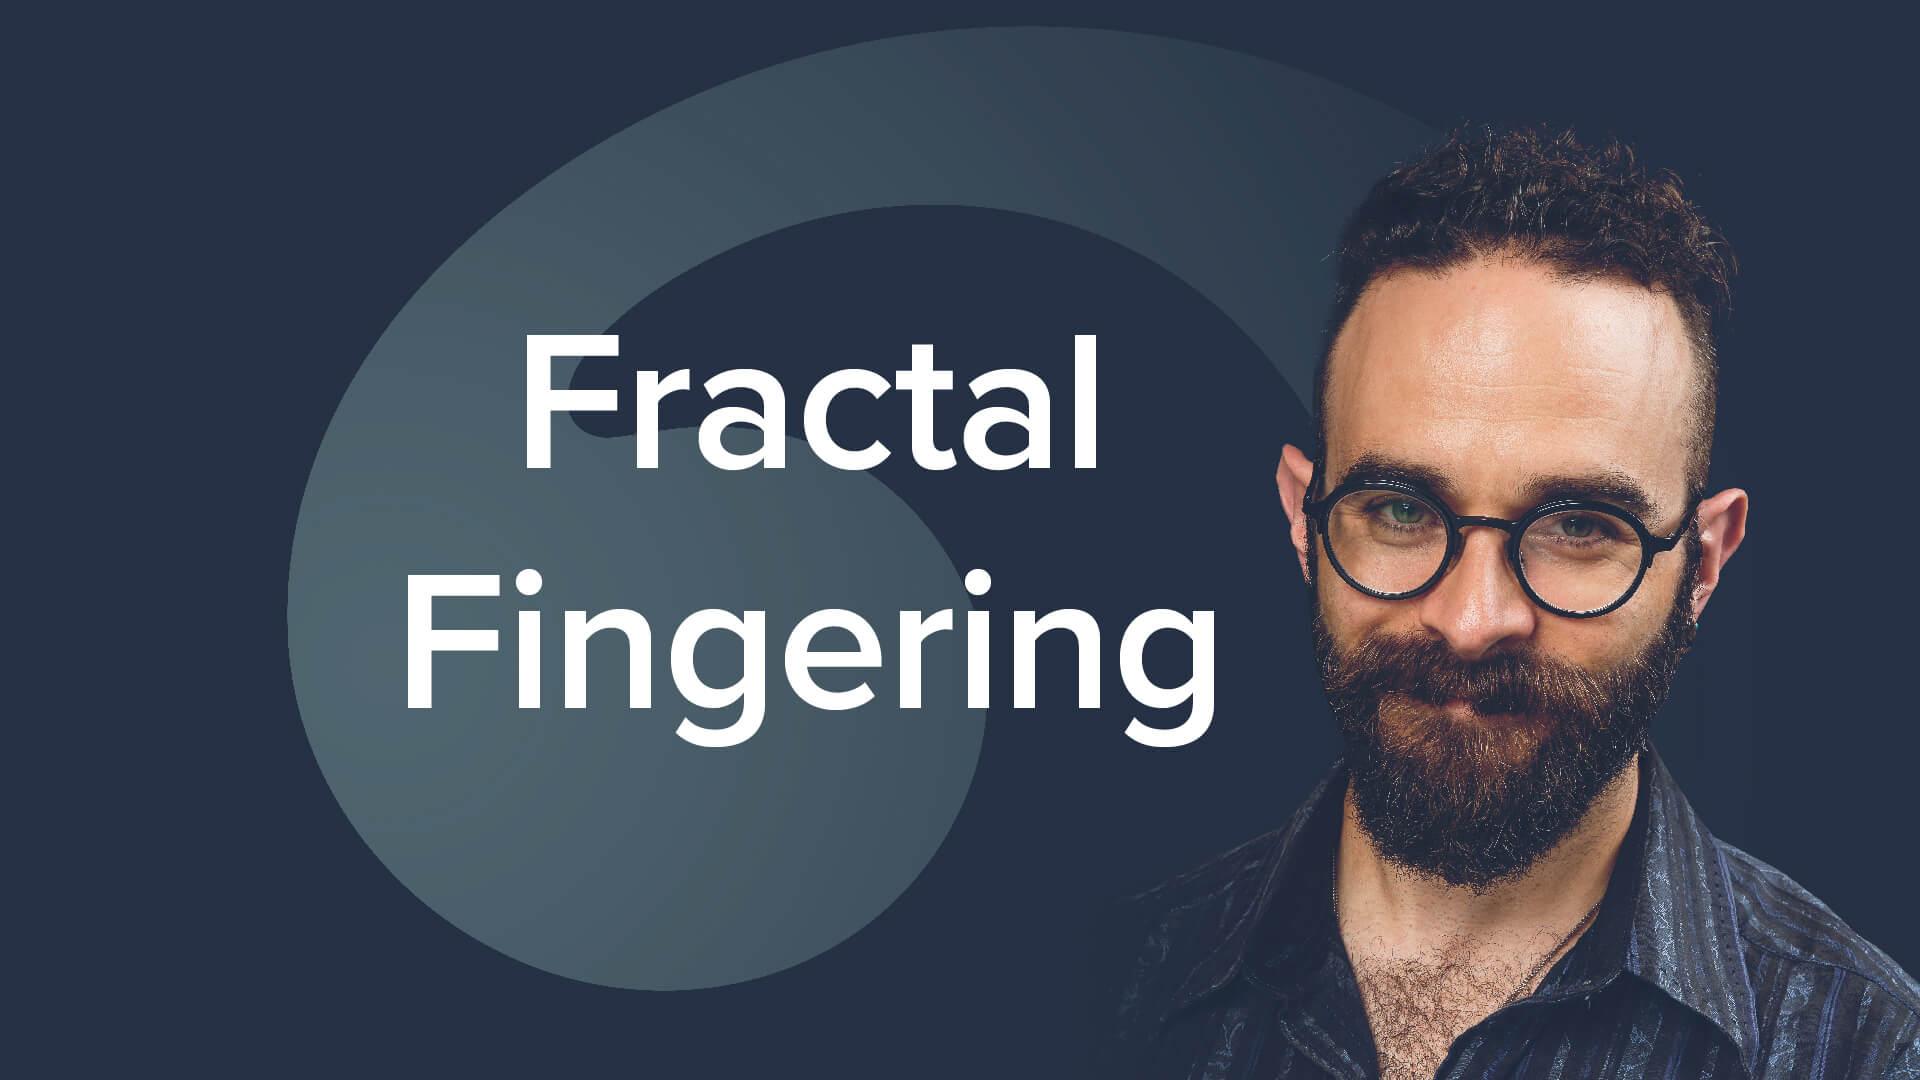 Fractal Fingering by David Allen Moore